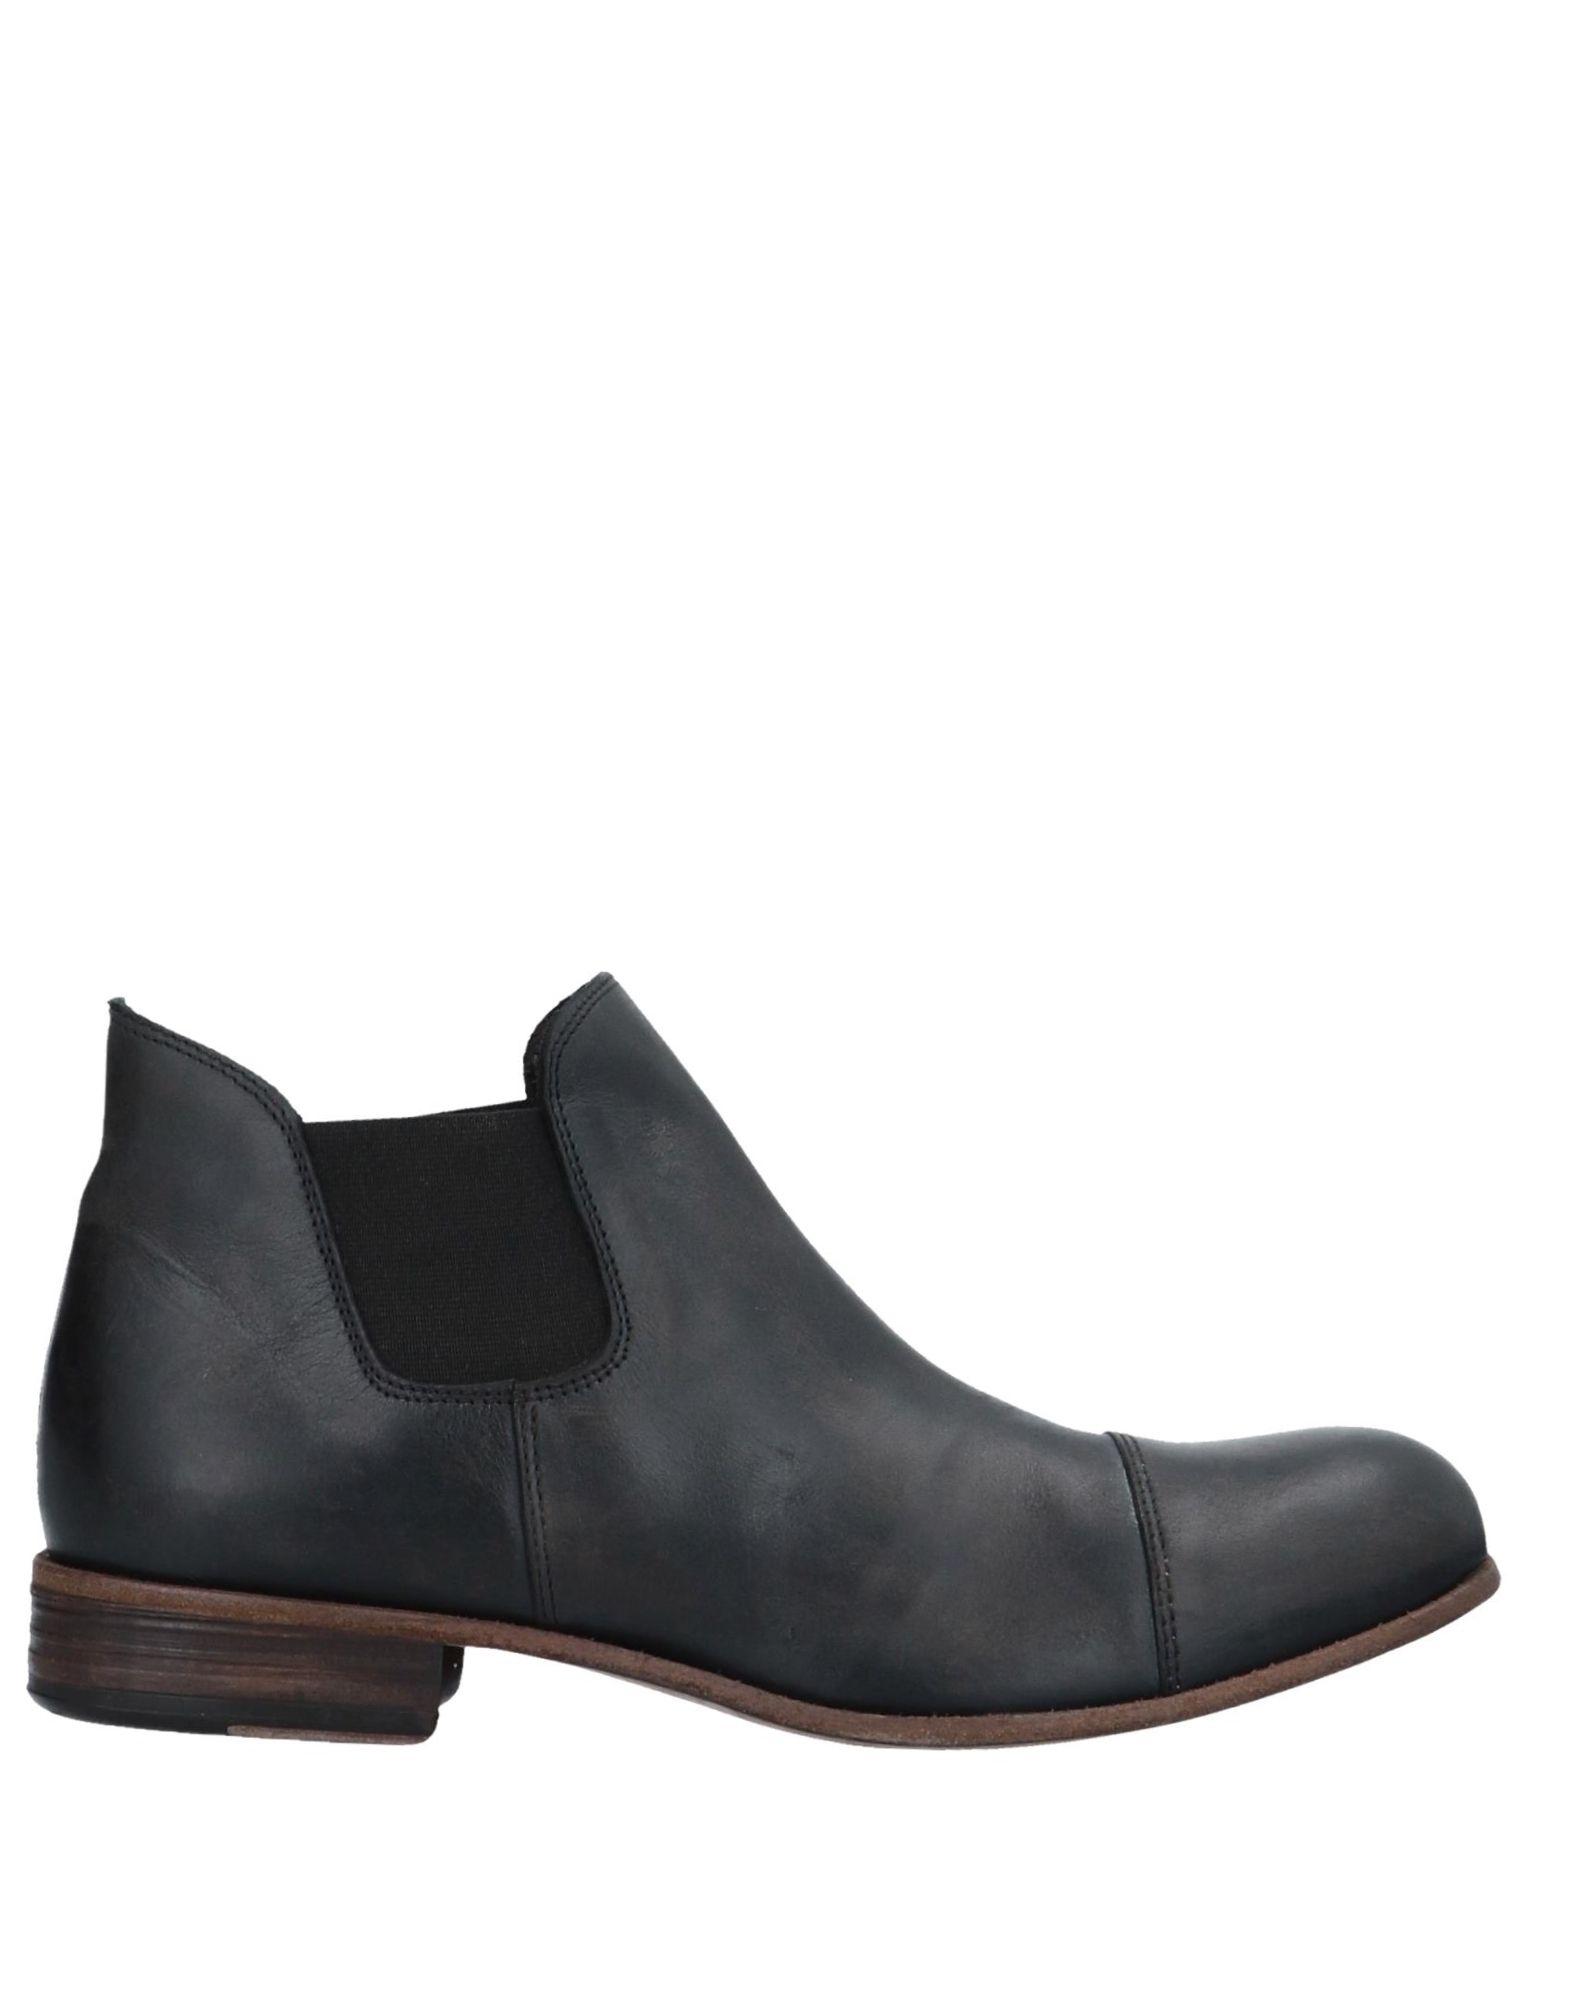 Chelsea Boots Seboy's Donna - 11537815DC